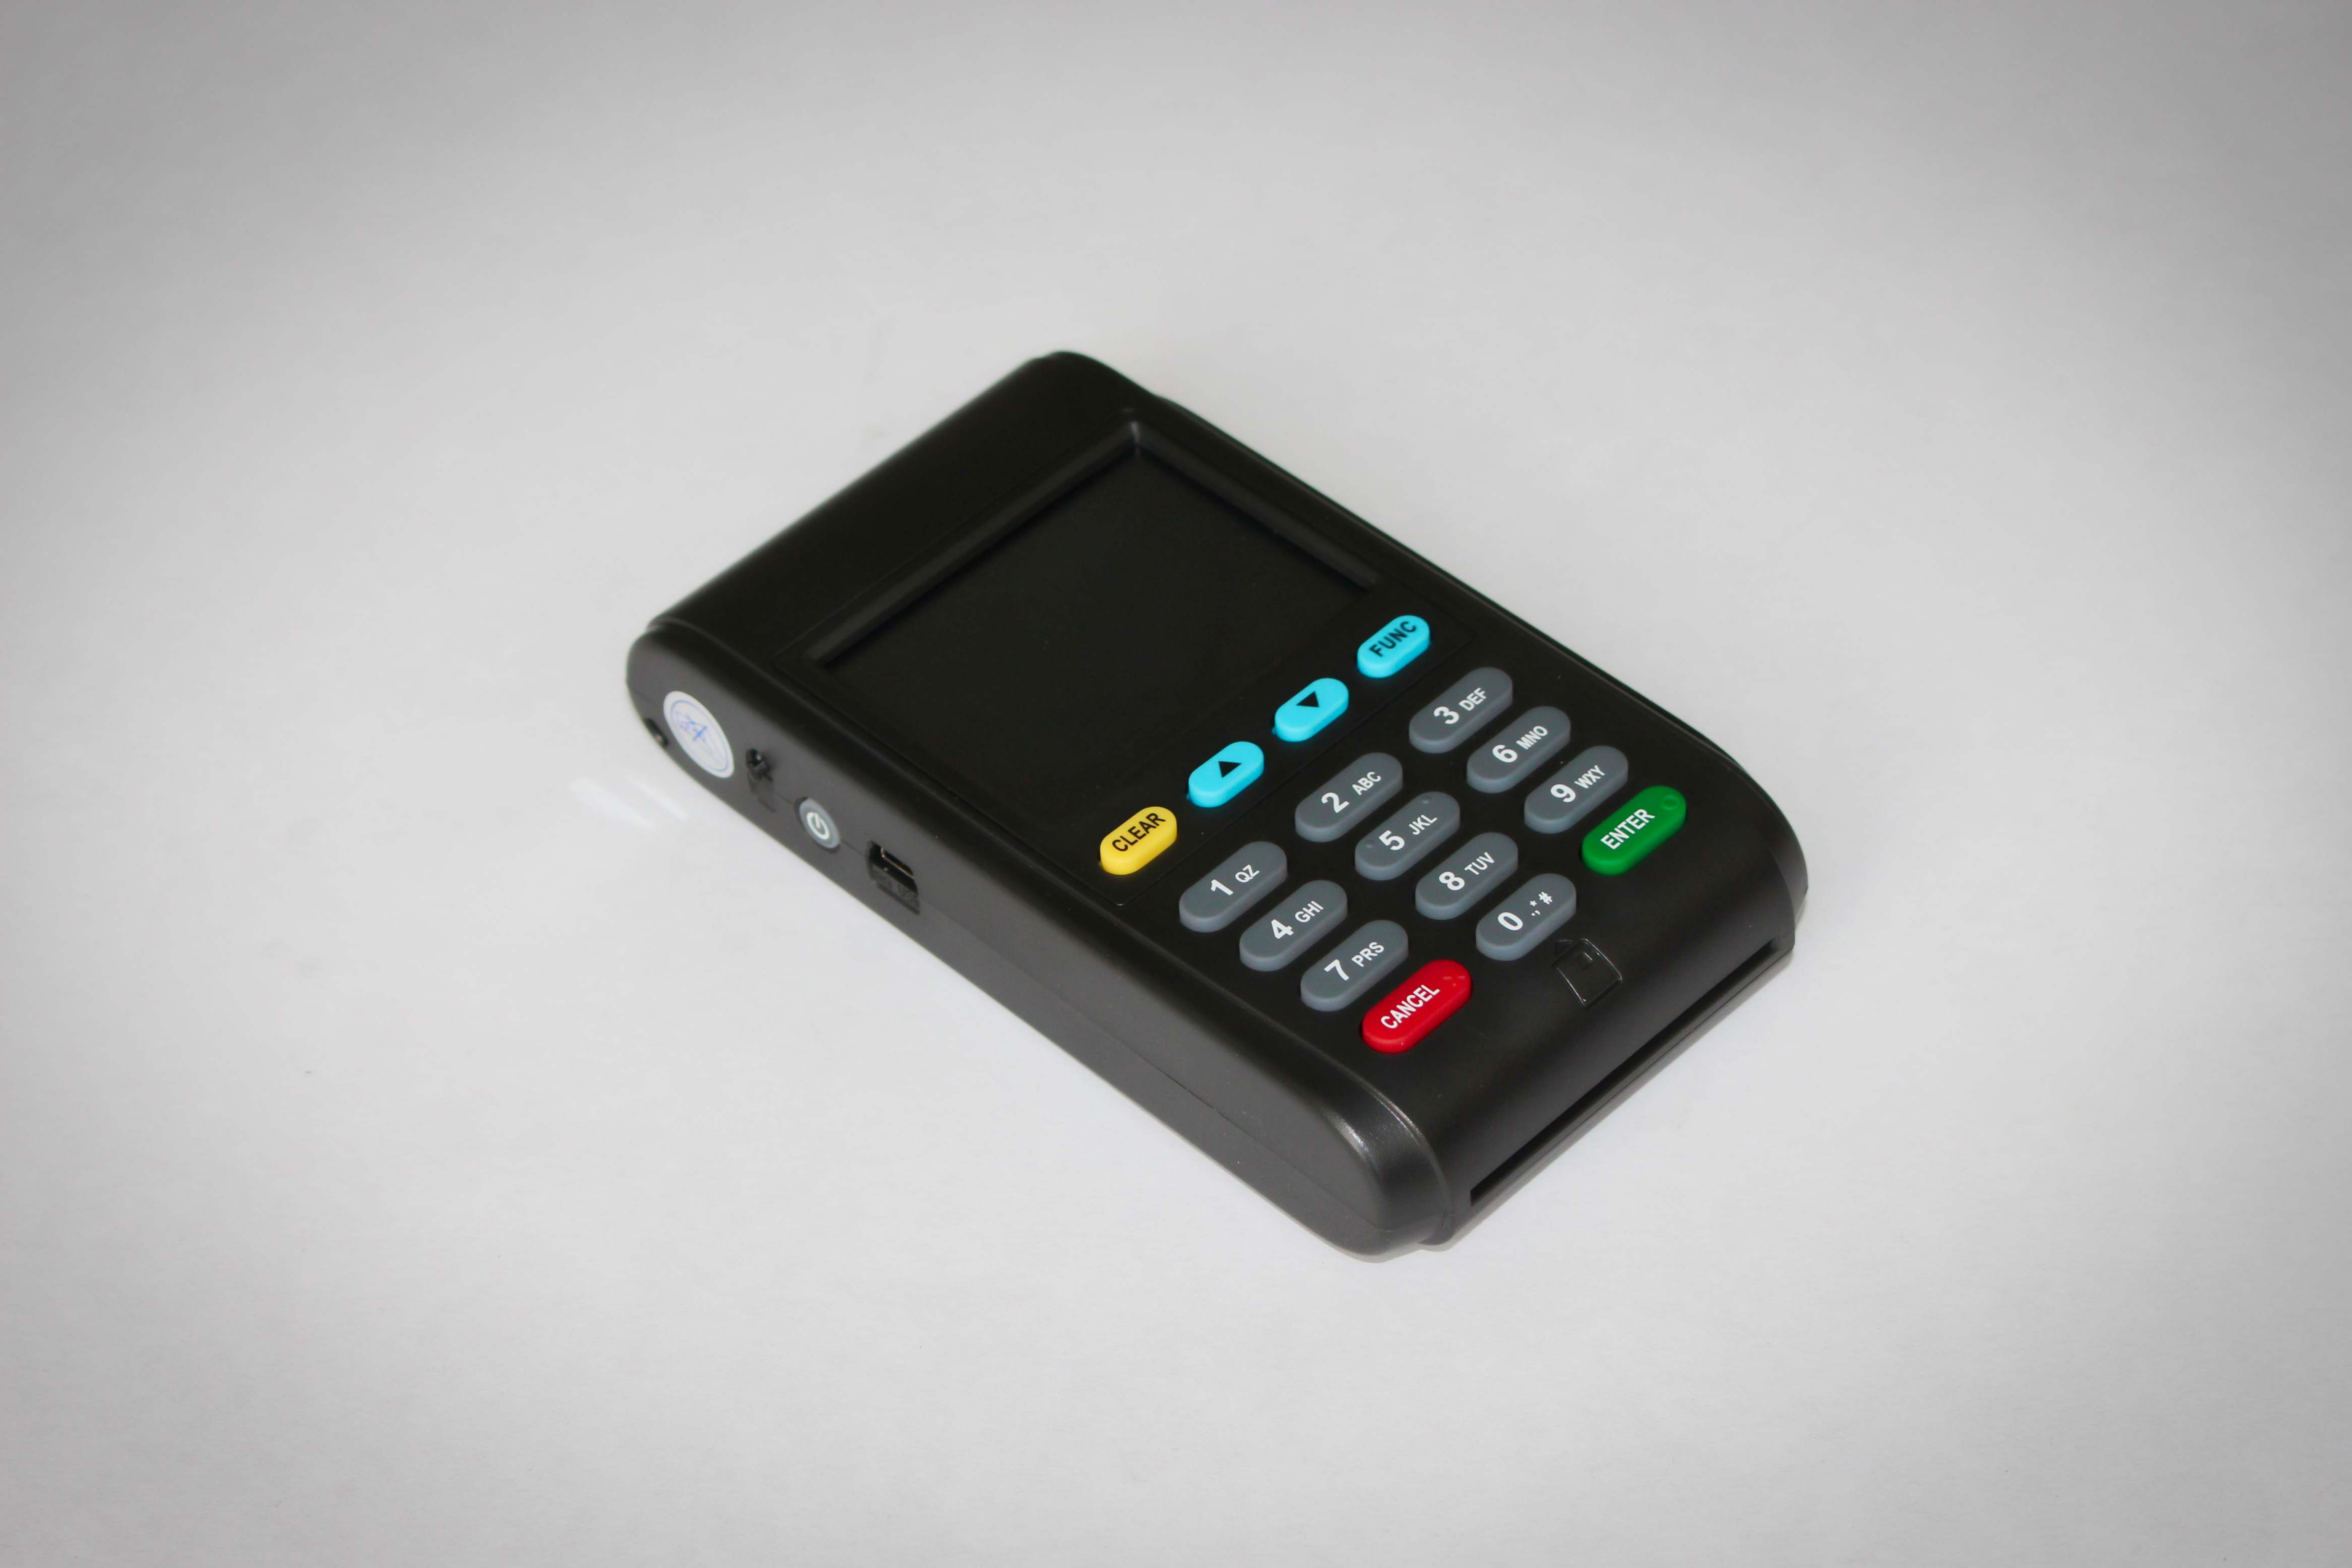 Банковский платежный miniPOS-терминал NEW6210